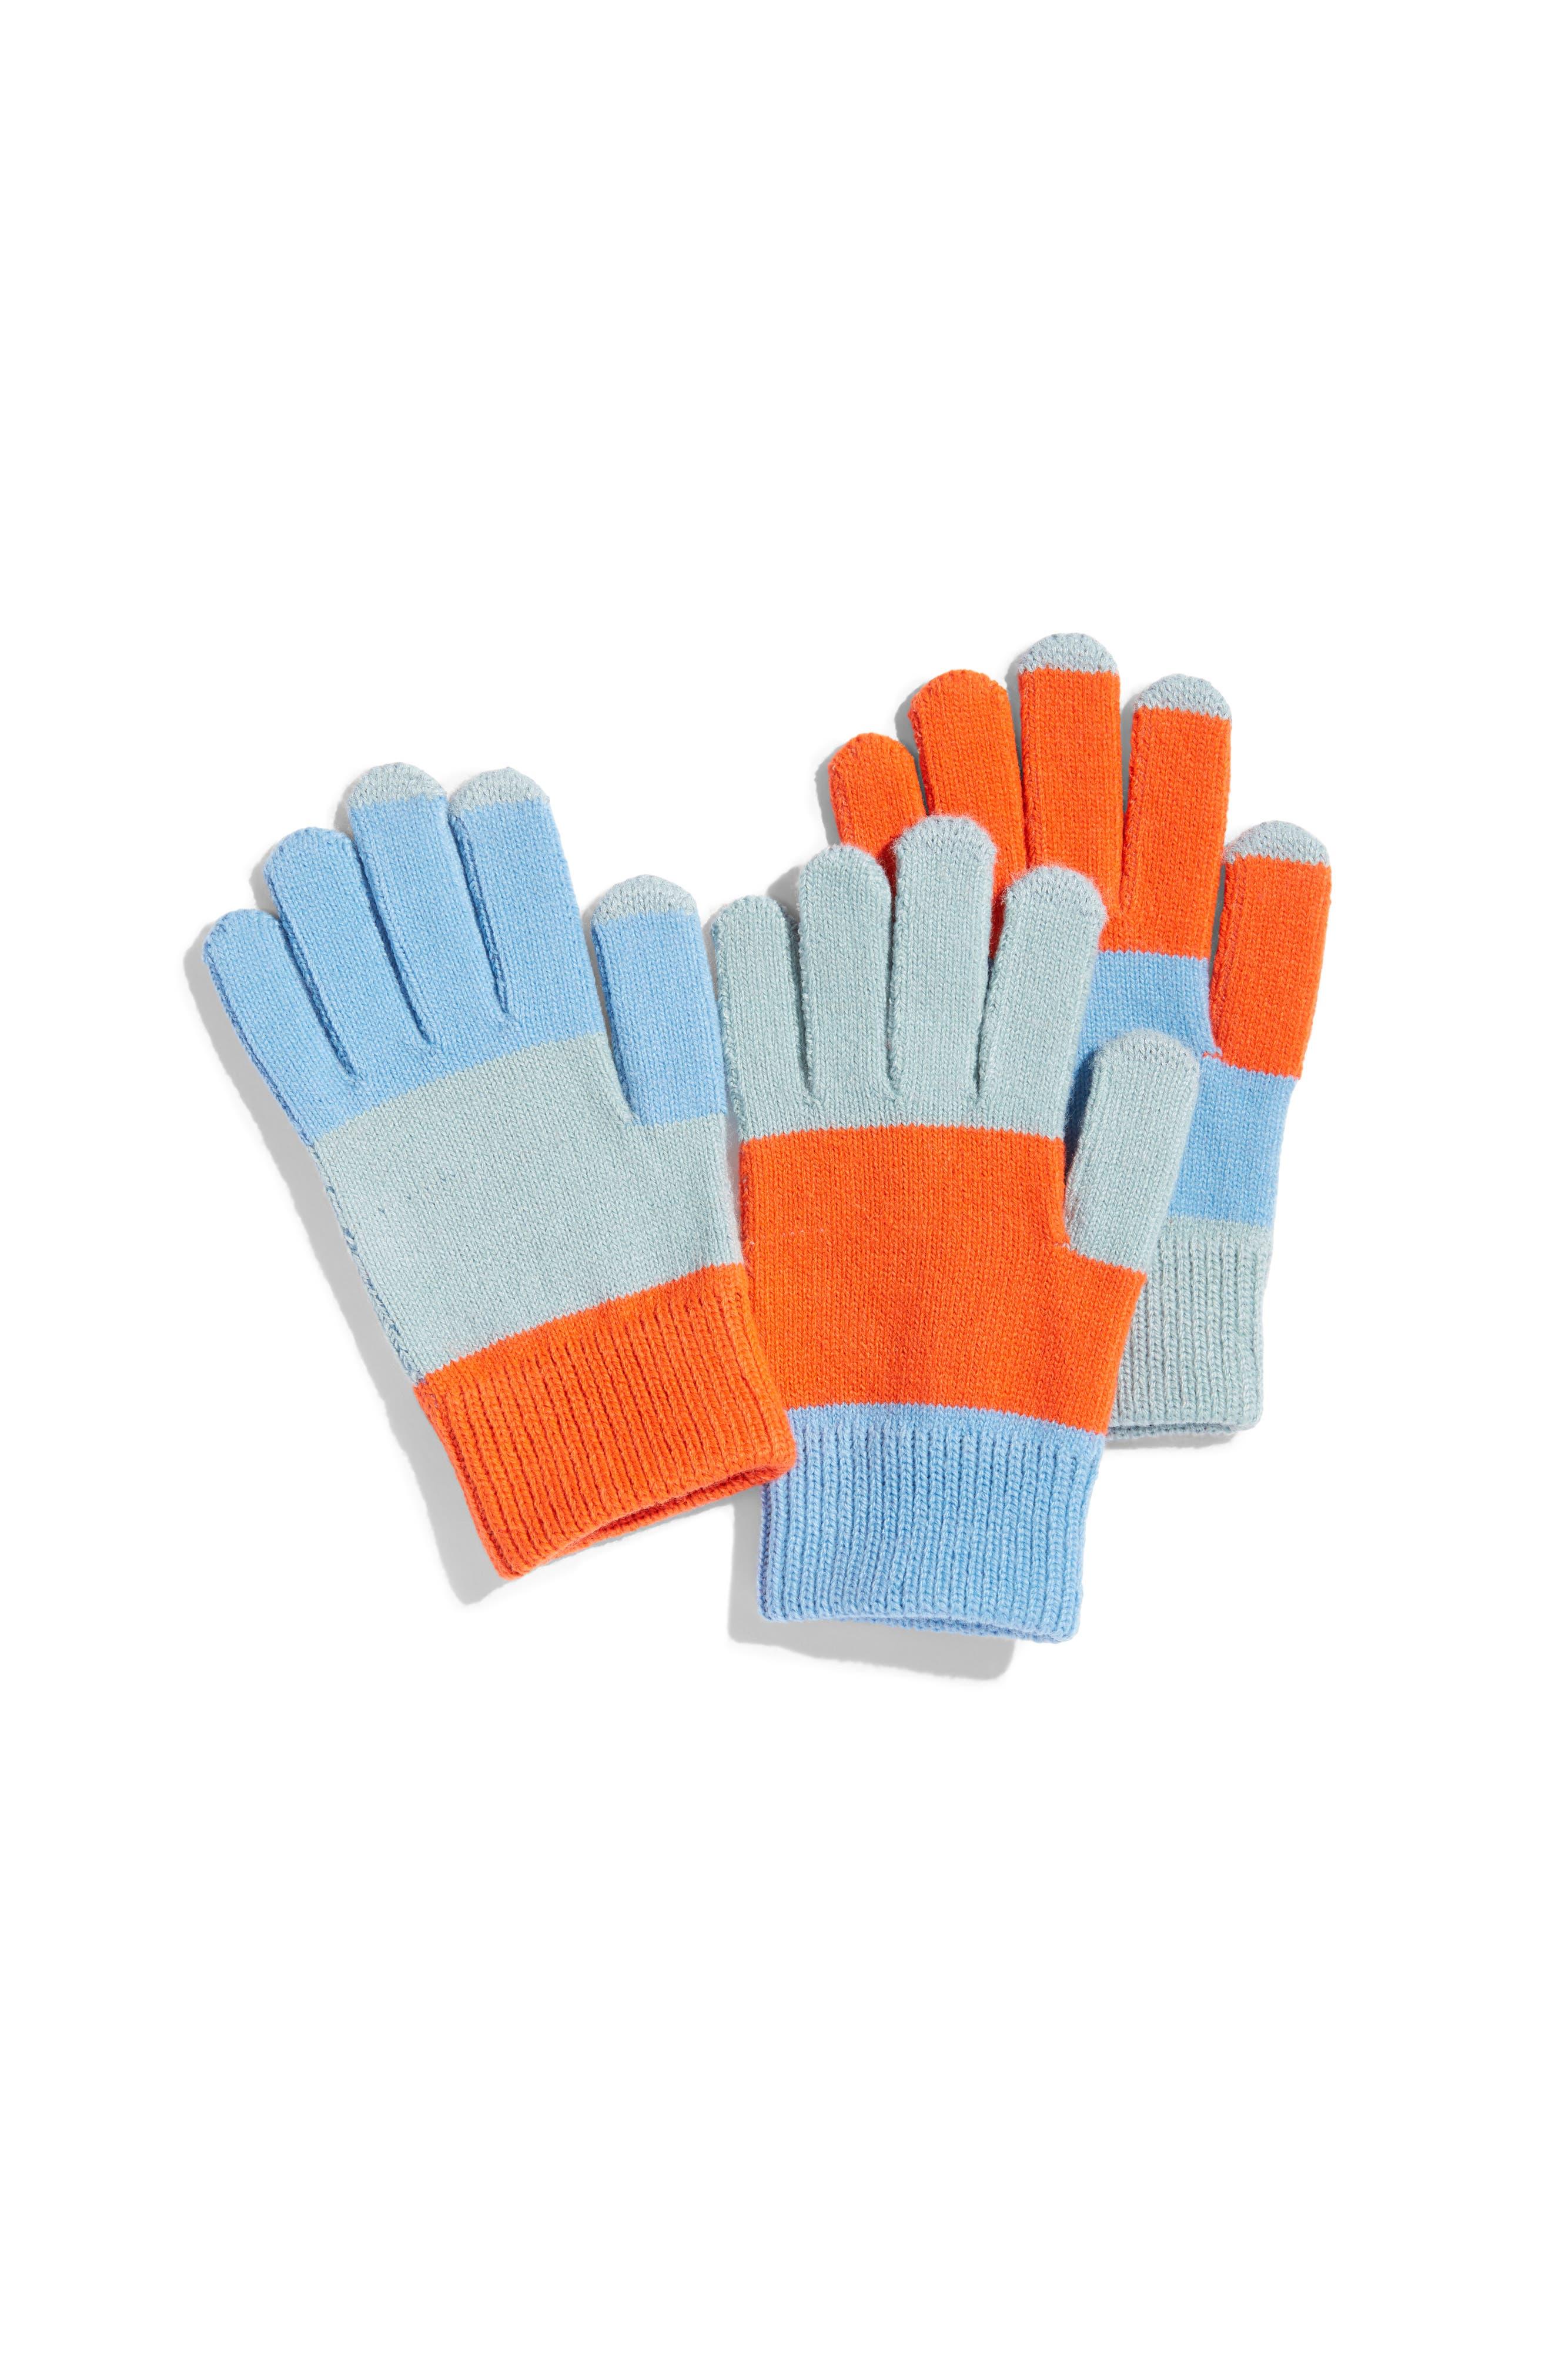 Pair & Spare Set of 3 Touchscreen Gloves,                             Main thumbnail 1, color,                             BLUES ORANGE